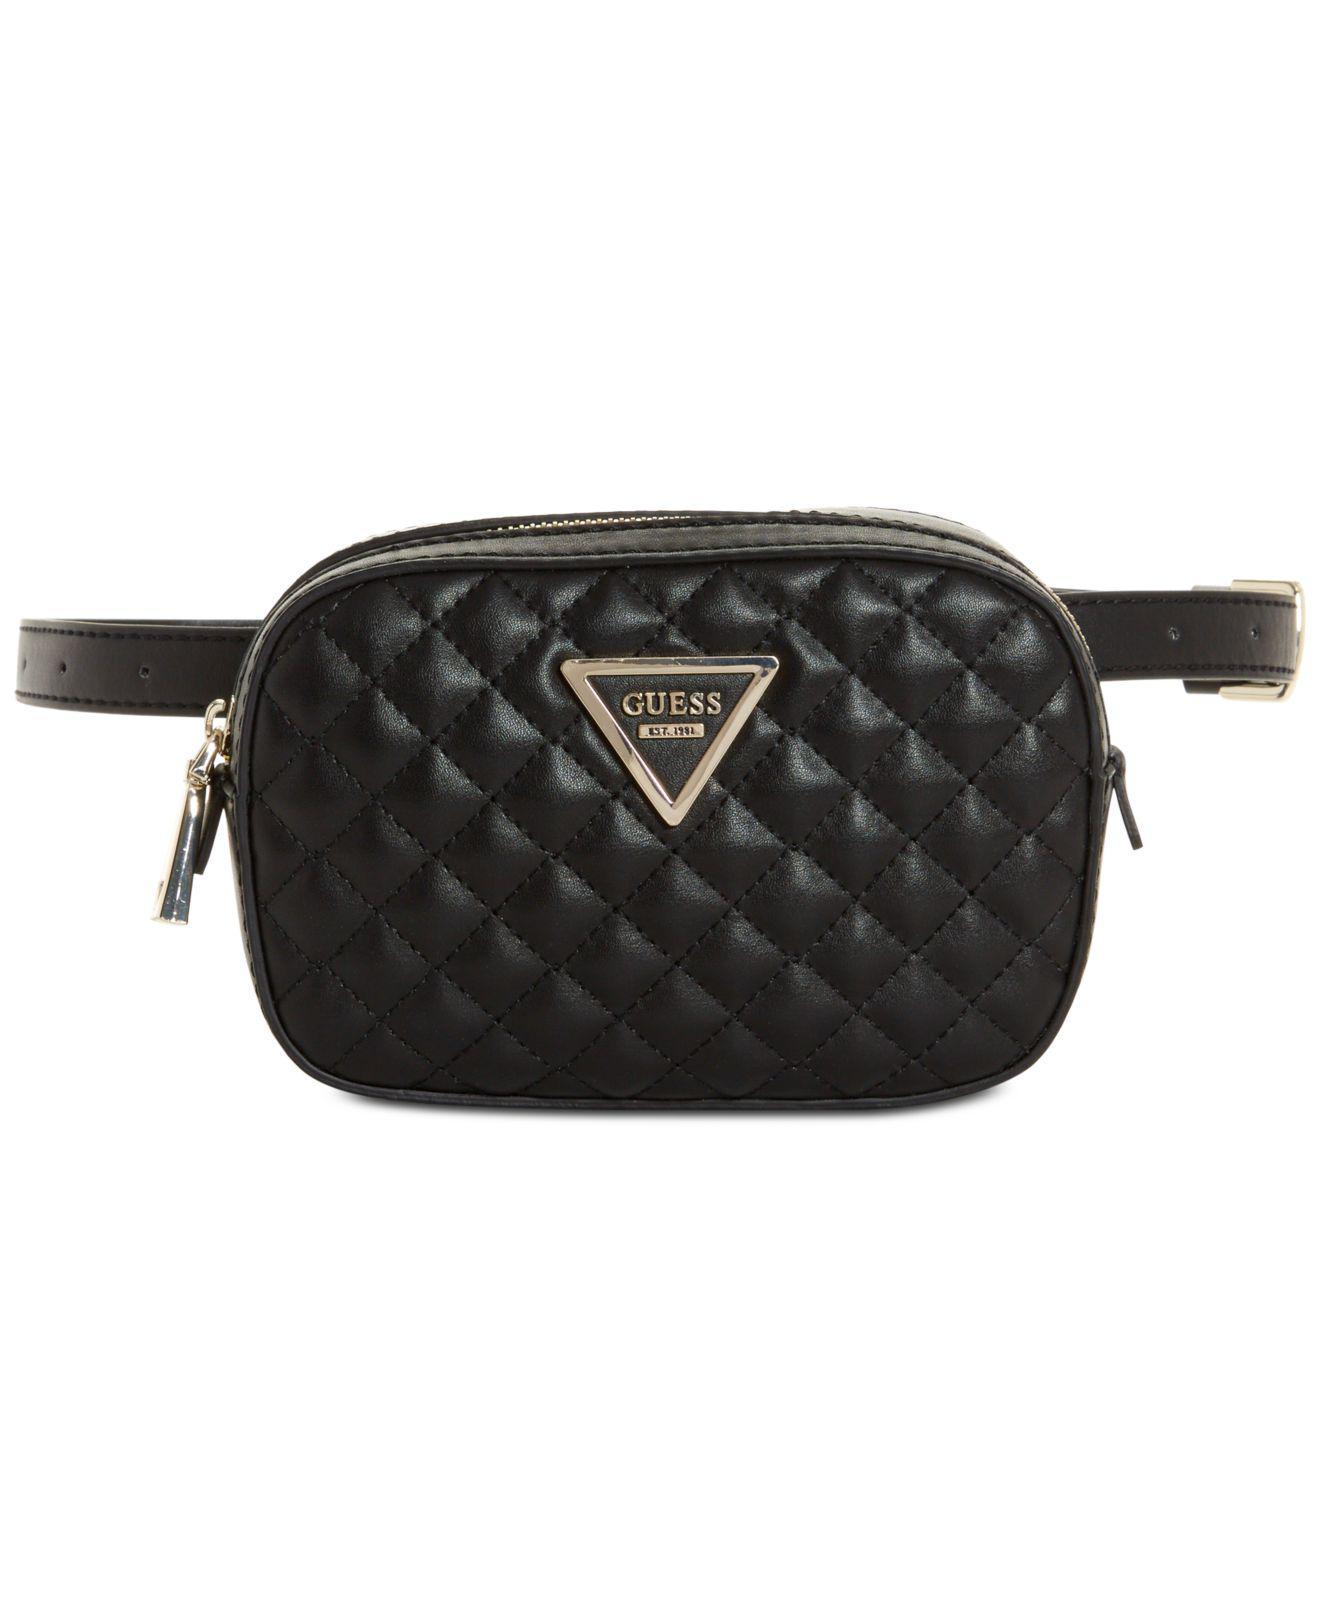 Lyst - Guess Varsity Pop Mini Belt Bag in Black 4538c836bd068